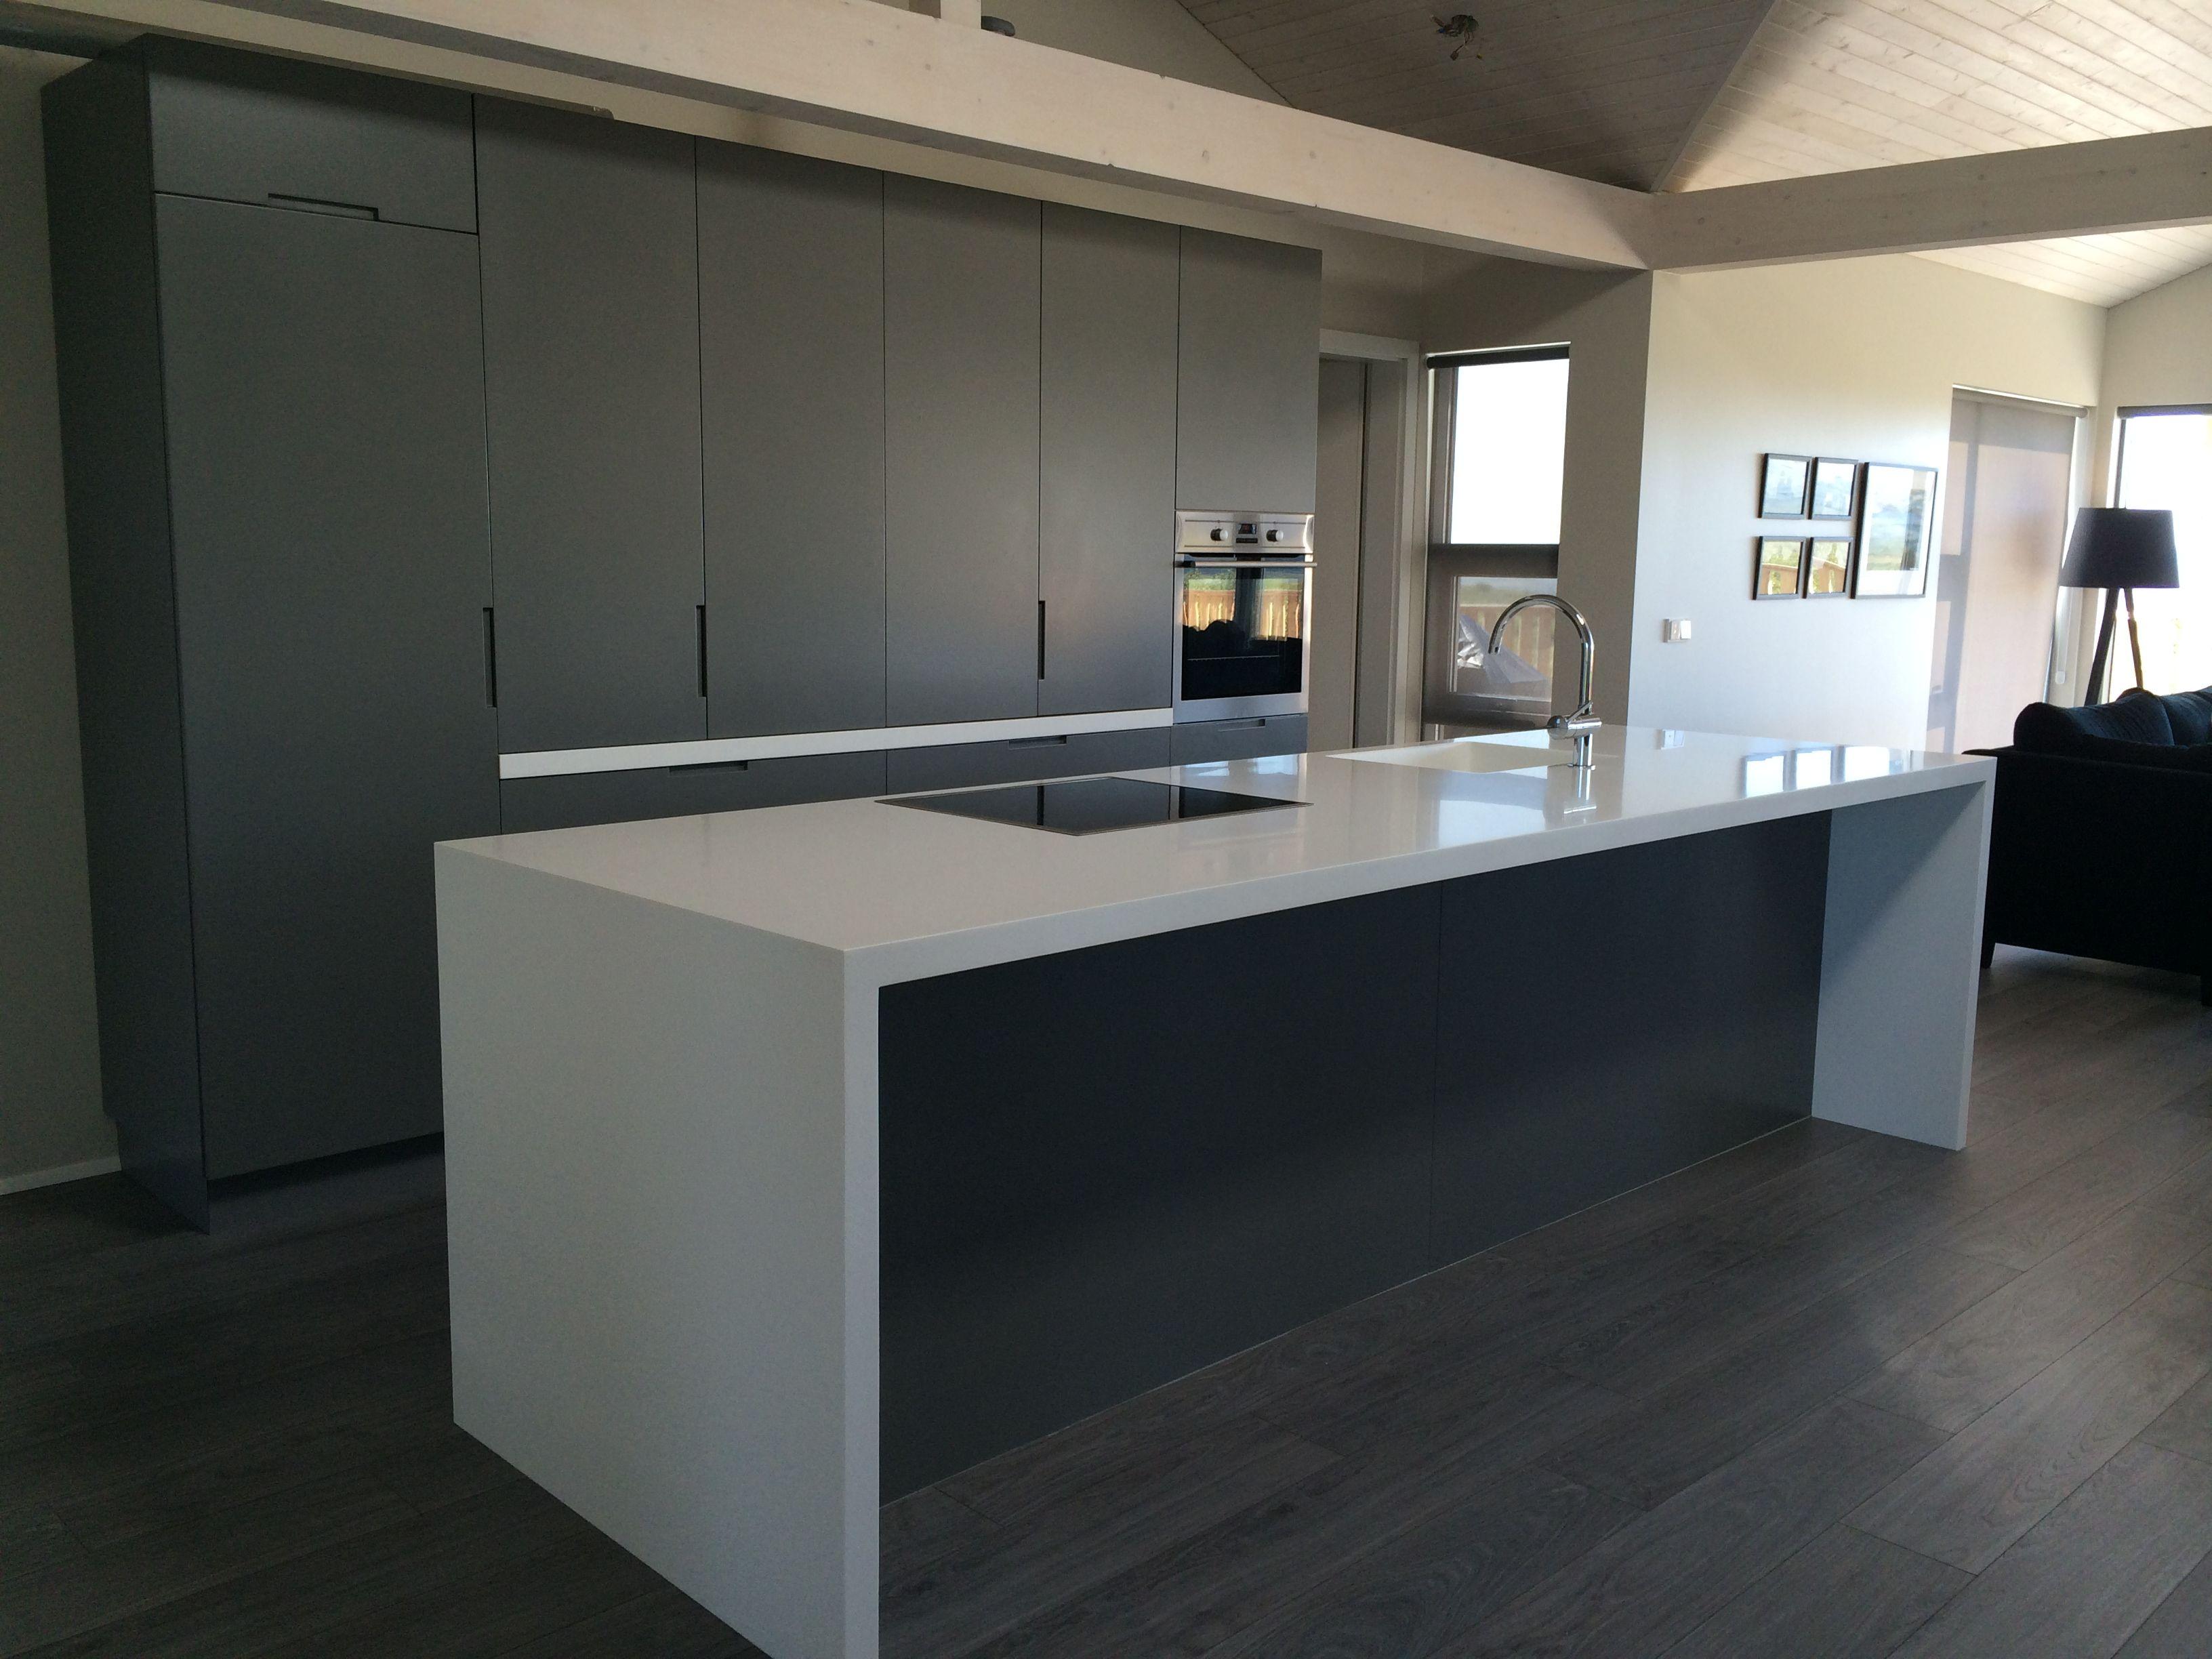 Best Kitchens Grey Interior Valey Benediktsdóttir 400 x 300